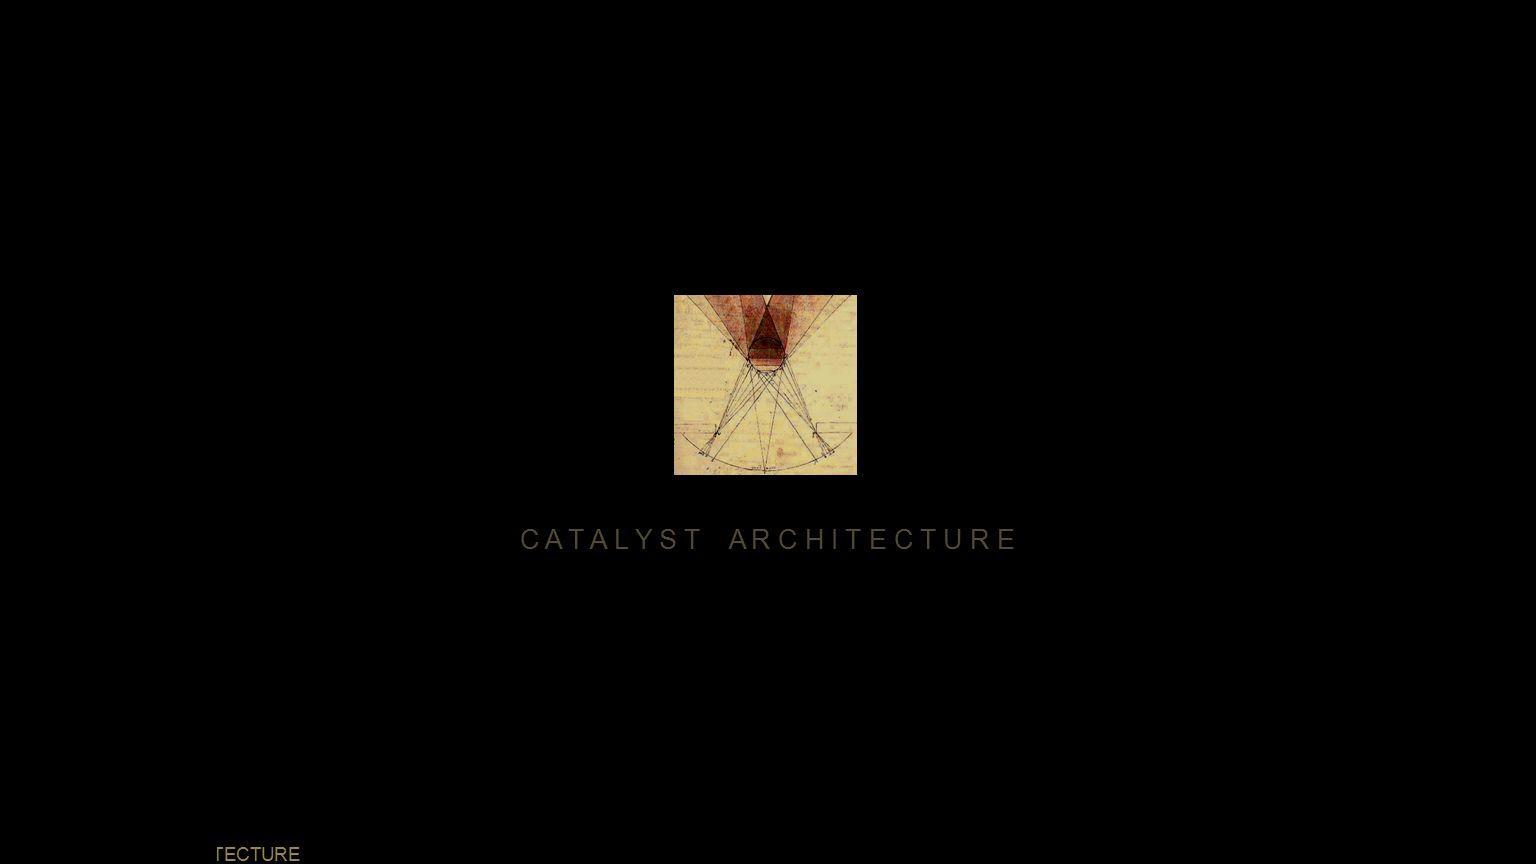 Catalyst Architecture CATALYST ARCHITECTURE